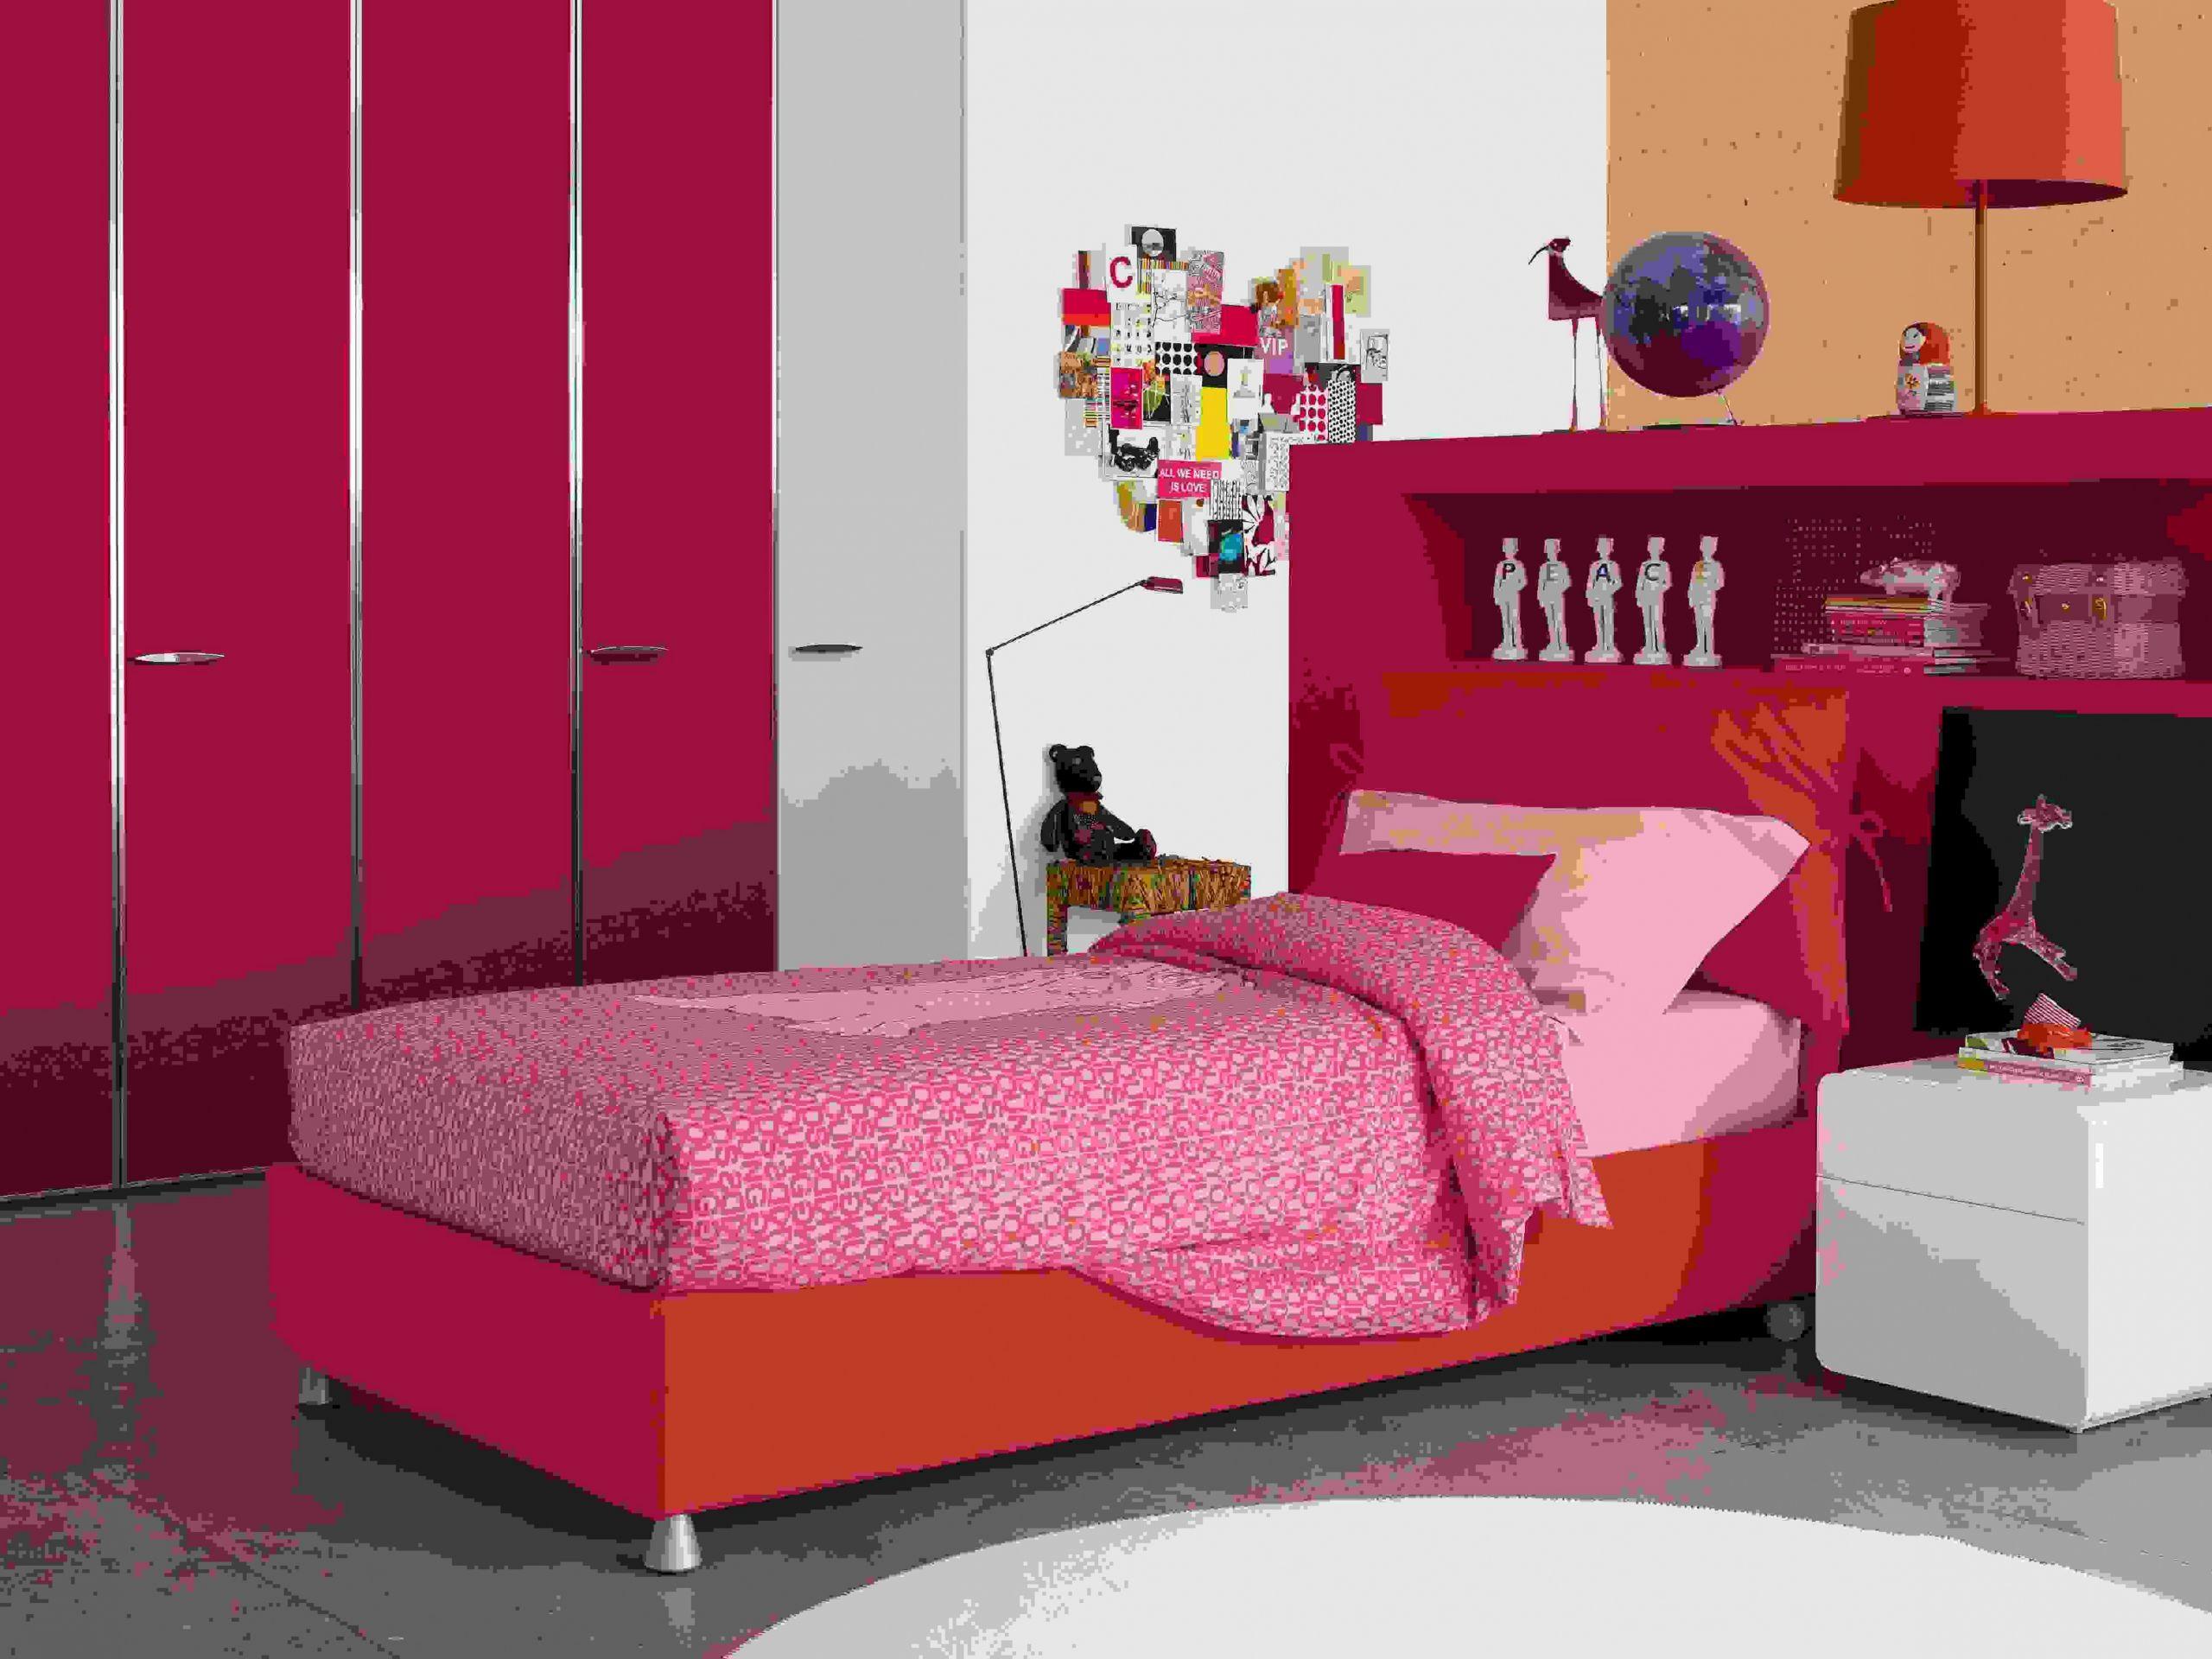 deco chambre ado fille 17 ans frais chambre design 16 wie folgt kann idee chambre d ado fille of idee chambre d ado fille